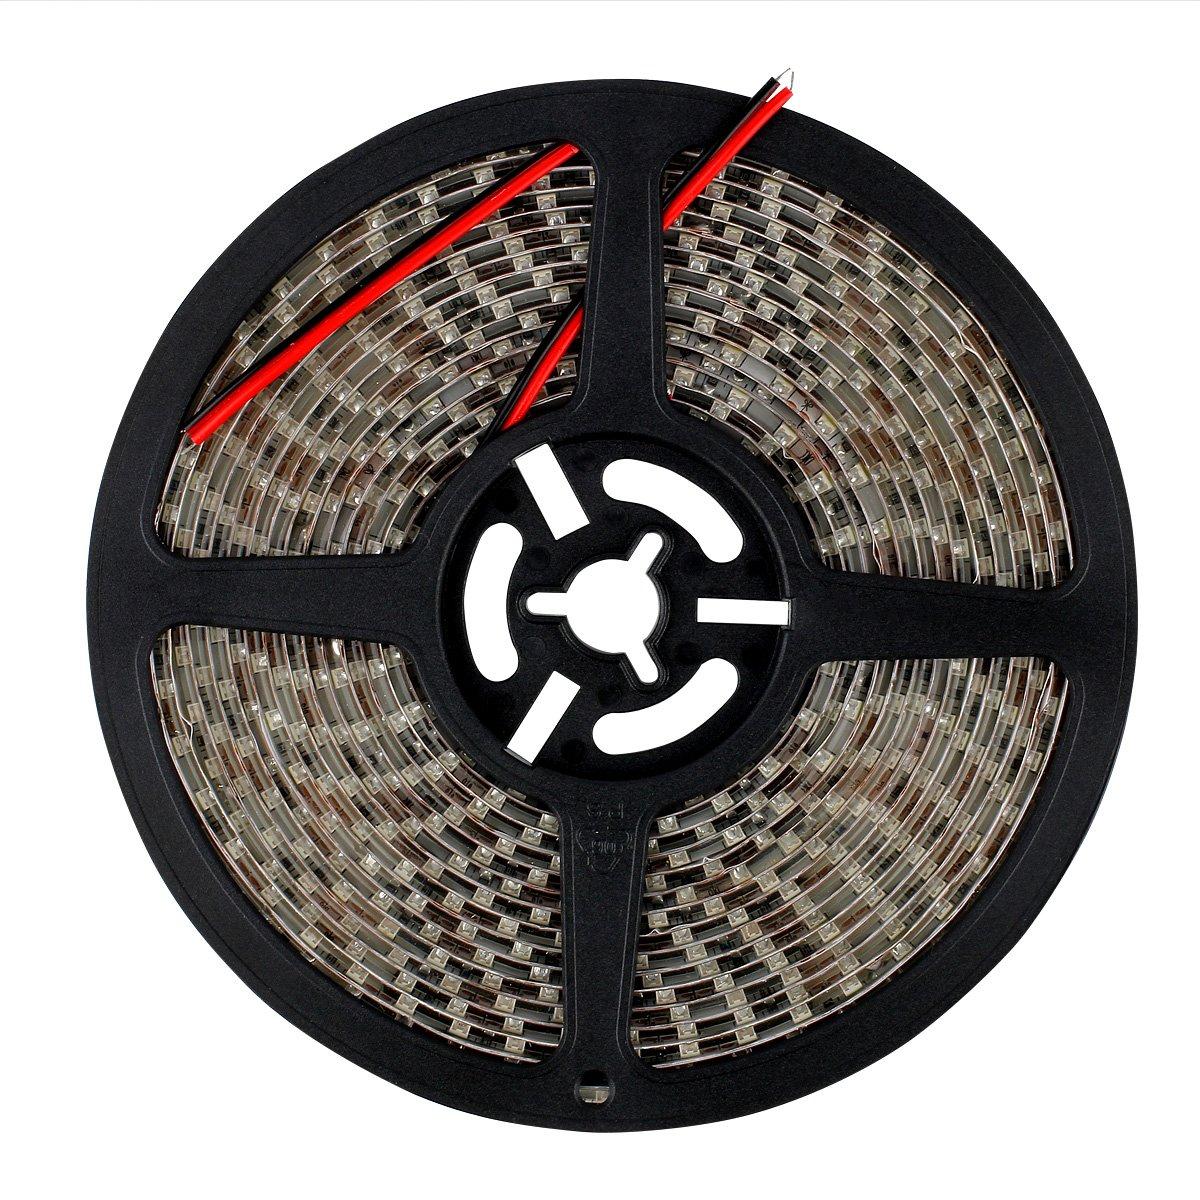 SUPERNIGHT High Density Green Waterproof Led Light Strip, SMD 3528, 5 Meter or 16 Ft LED Strip 120 Leds/M by SUPERNIGHT (Image #7)